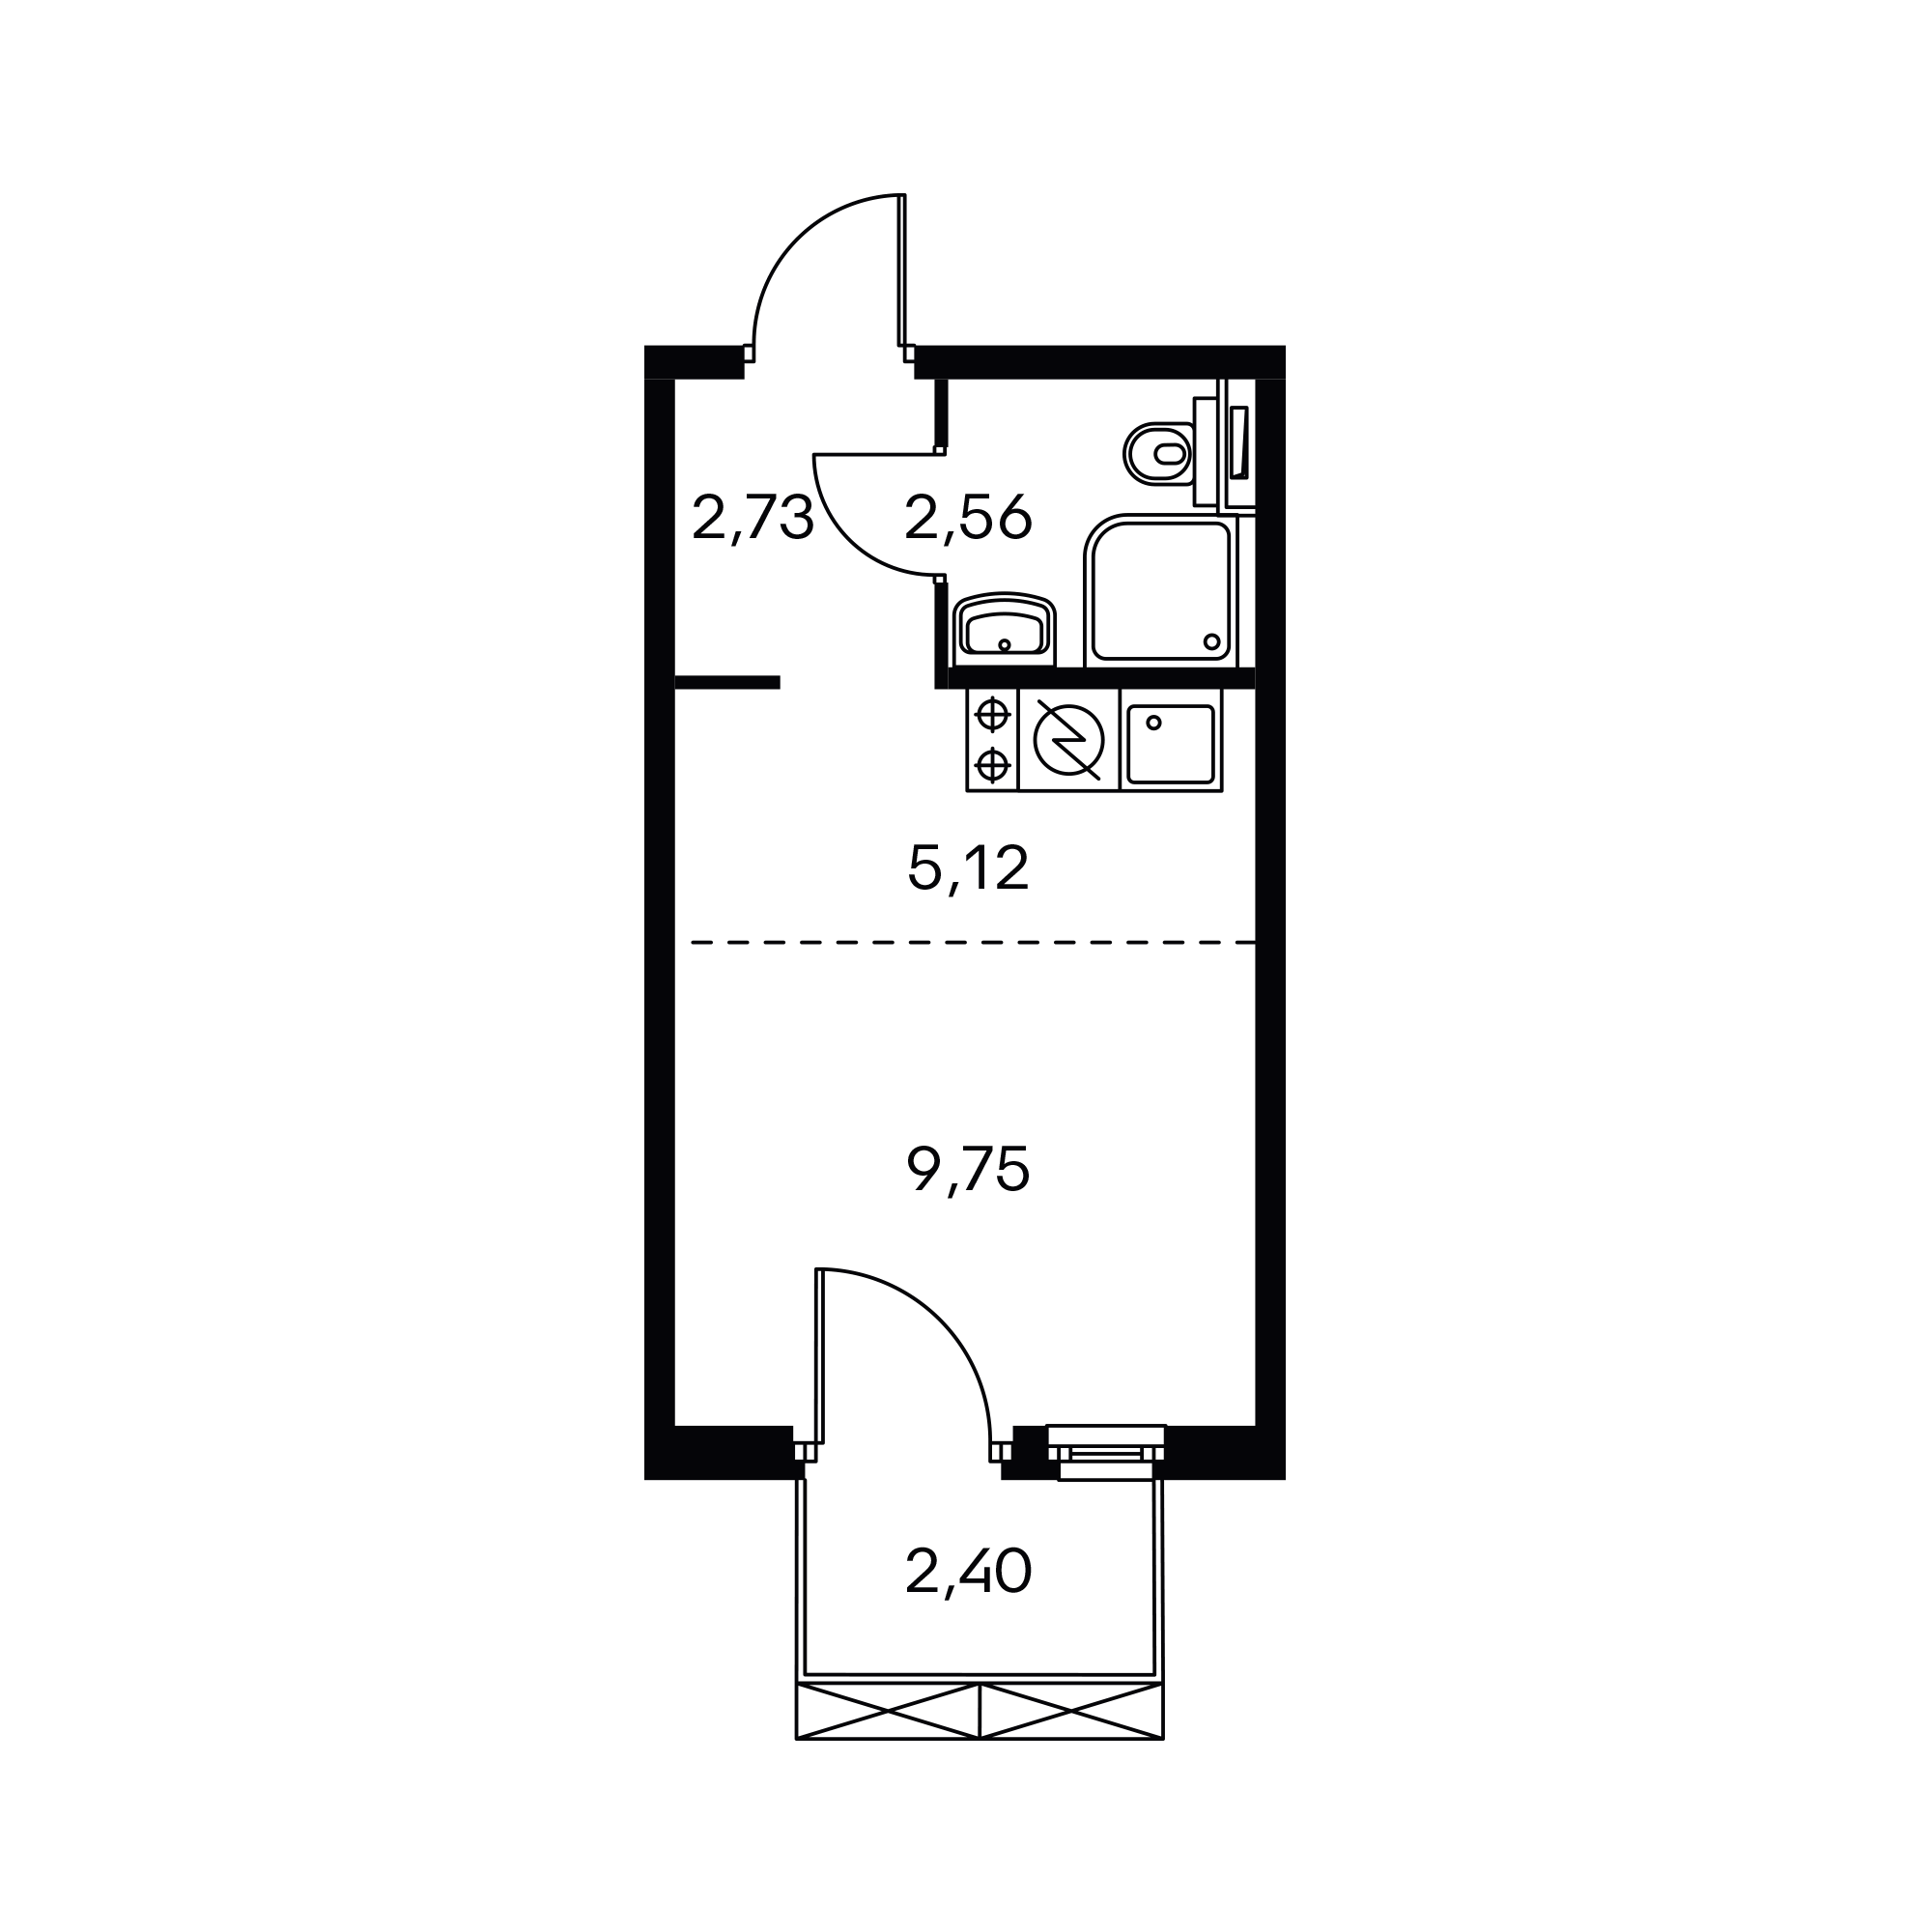 1NS1_3.6-1_B_S_A